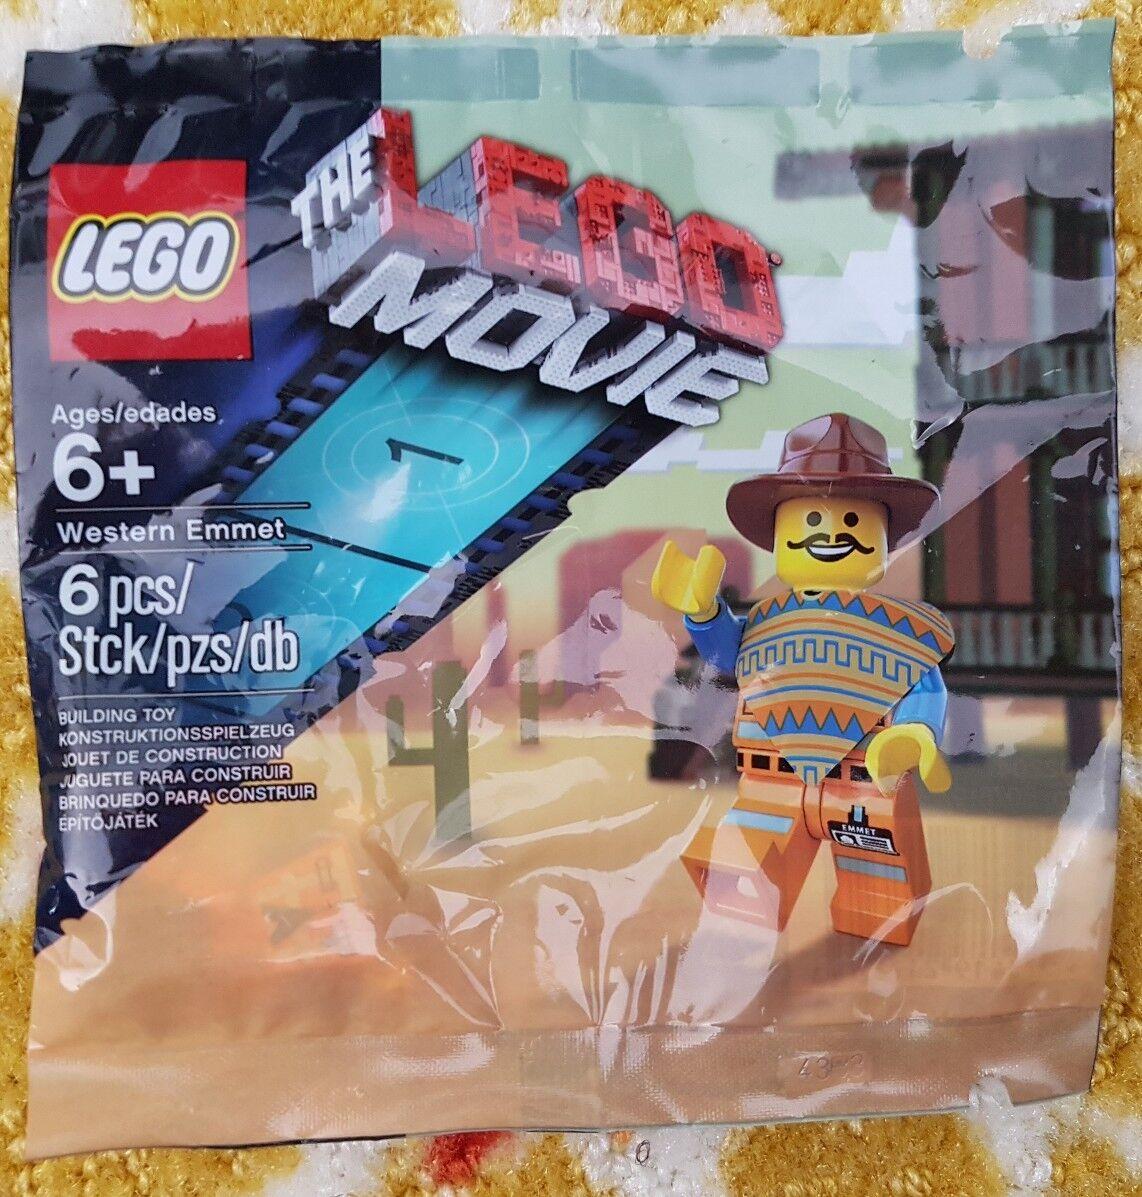 Neues lego westlichen emmet lego lego lego - film 6pc exklusive kooperation besiegelt - polybeutel 07a07e